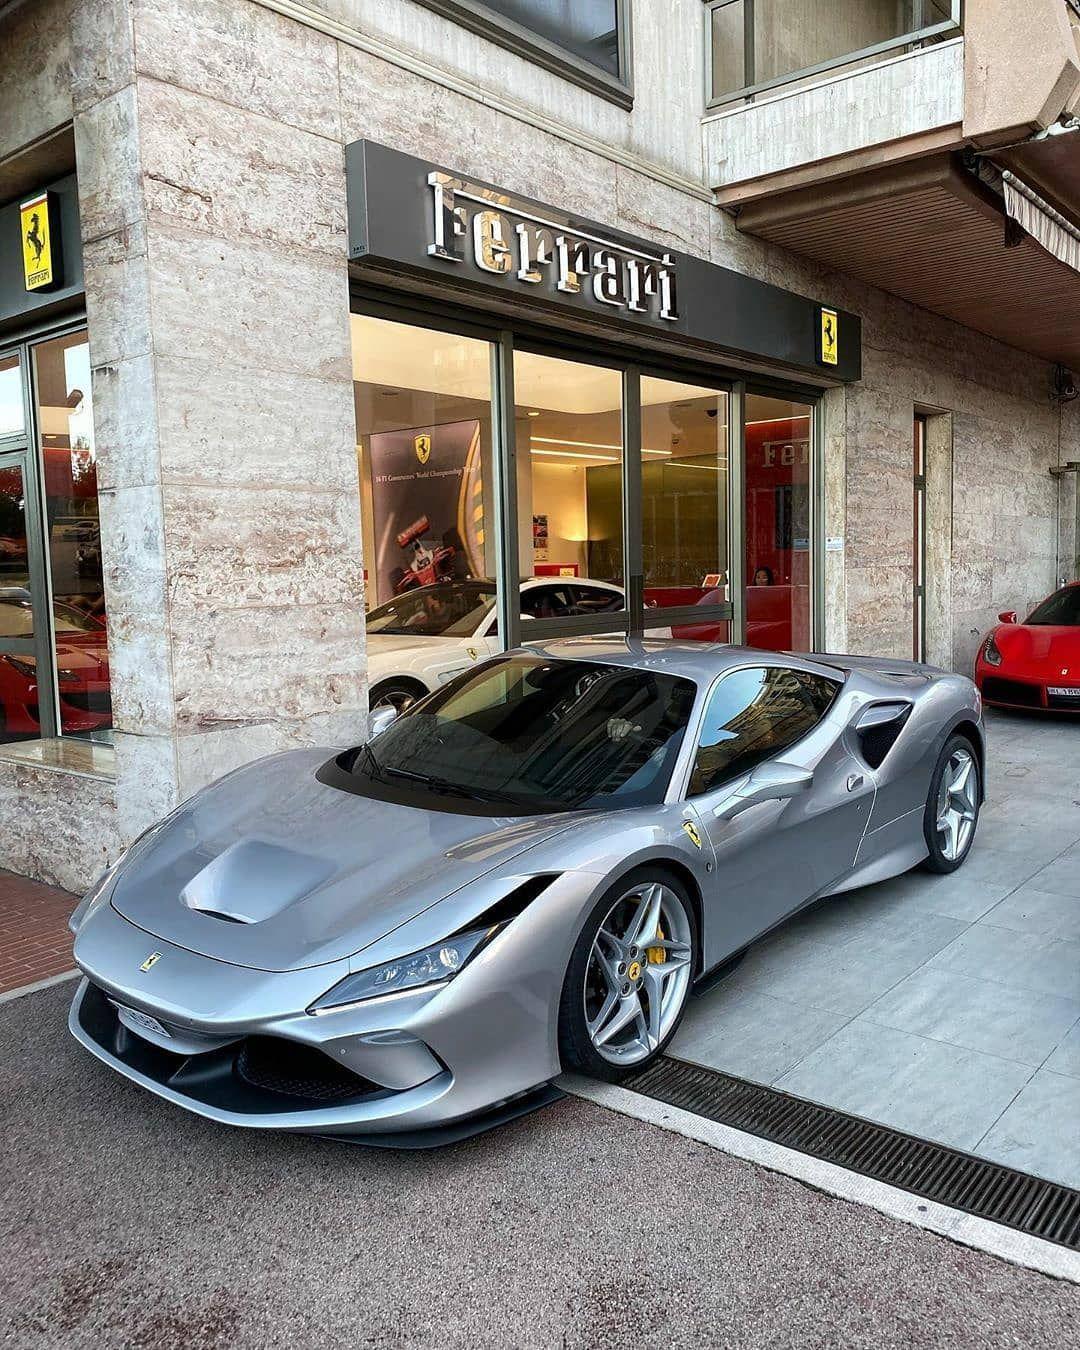 "Ferrari F8 Tributo Wallpapers: Ferrari F8 Tributo On Instagram: ""iPhone 11 📸 F8 Tributo"